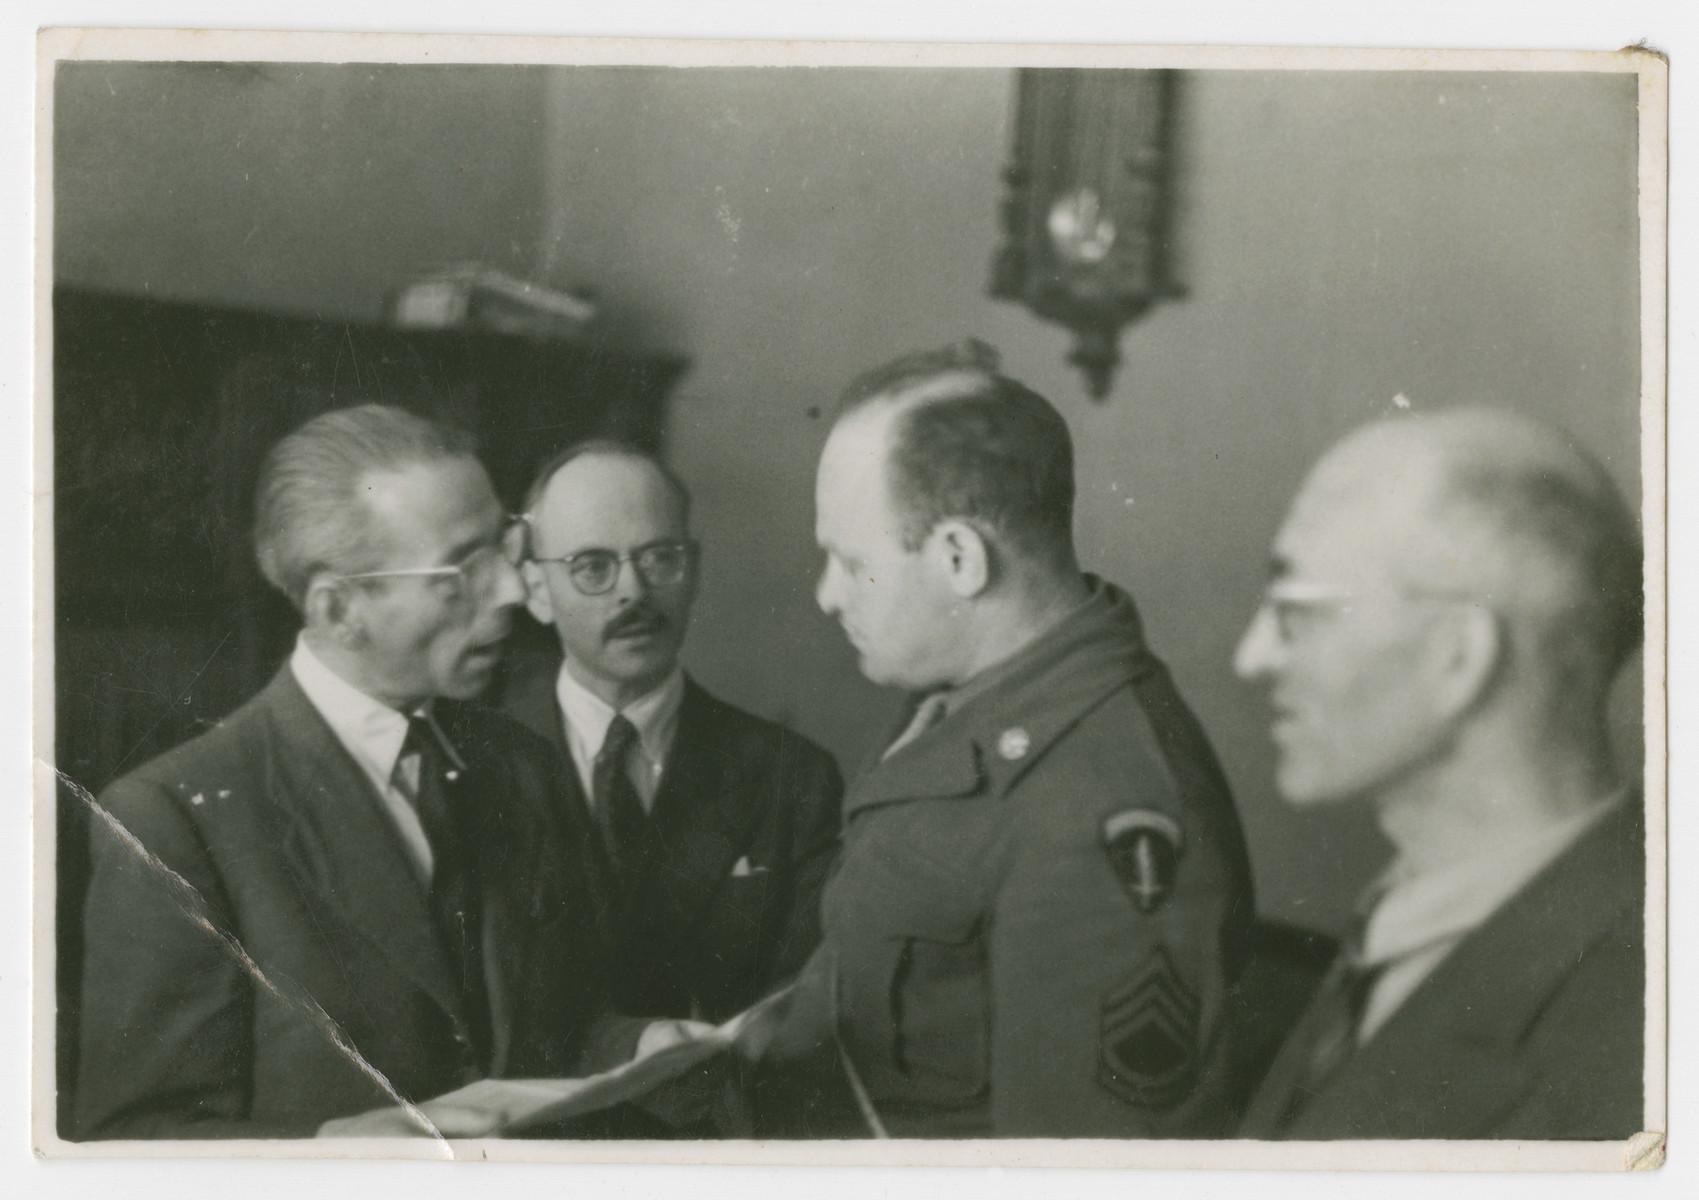 Jewish American serviceman and JDC aid worker David Eizenberg meets with three men in postwar Berlin.